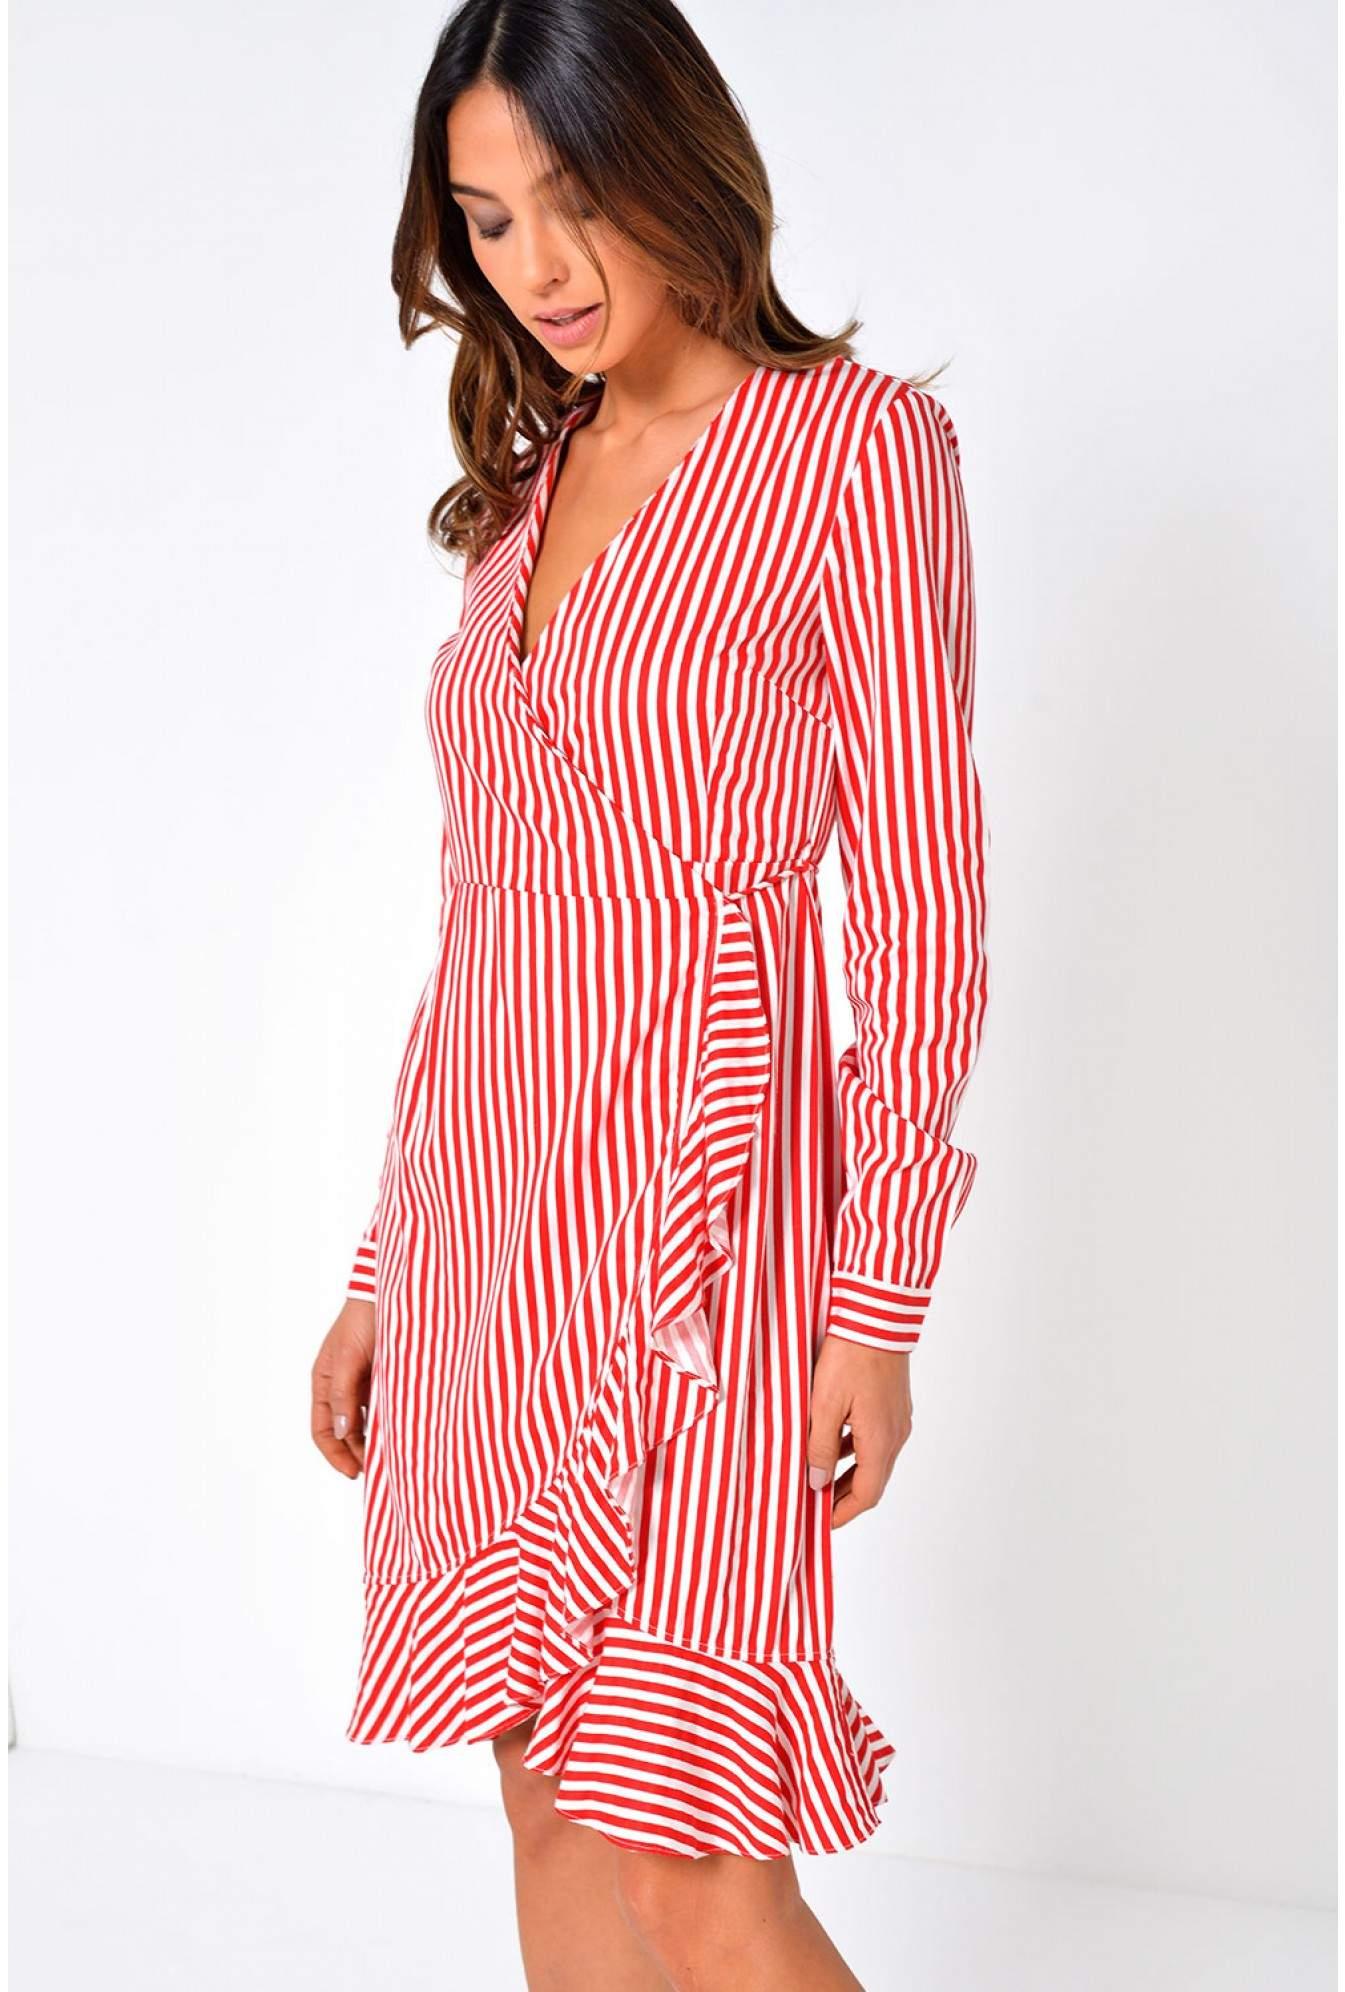 ad9592594fb11 Vero Moda Lizette Stripe Wrap Dress in Red   iCLOTHING